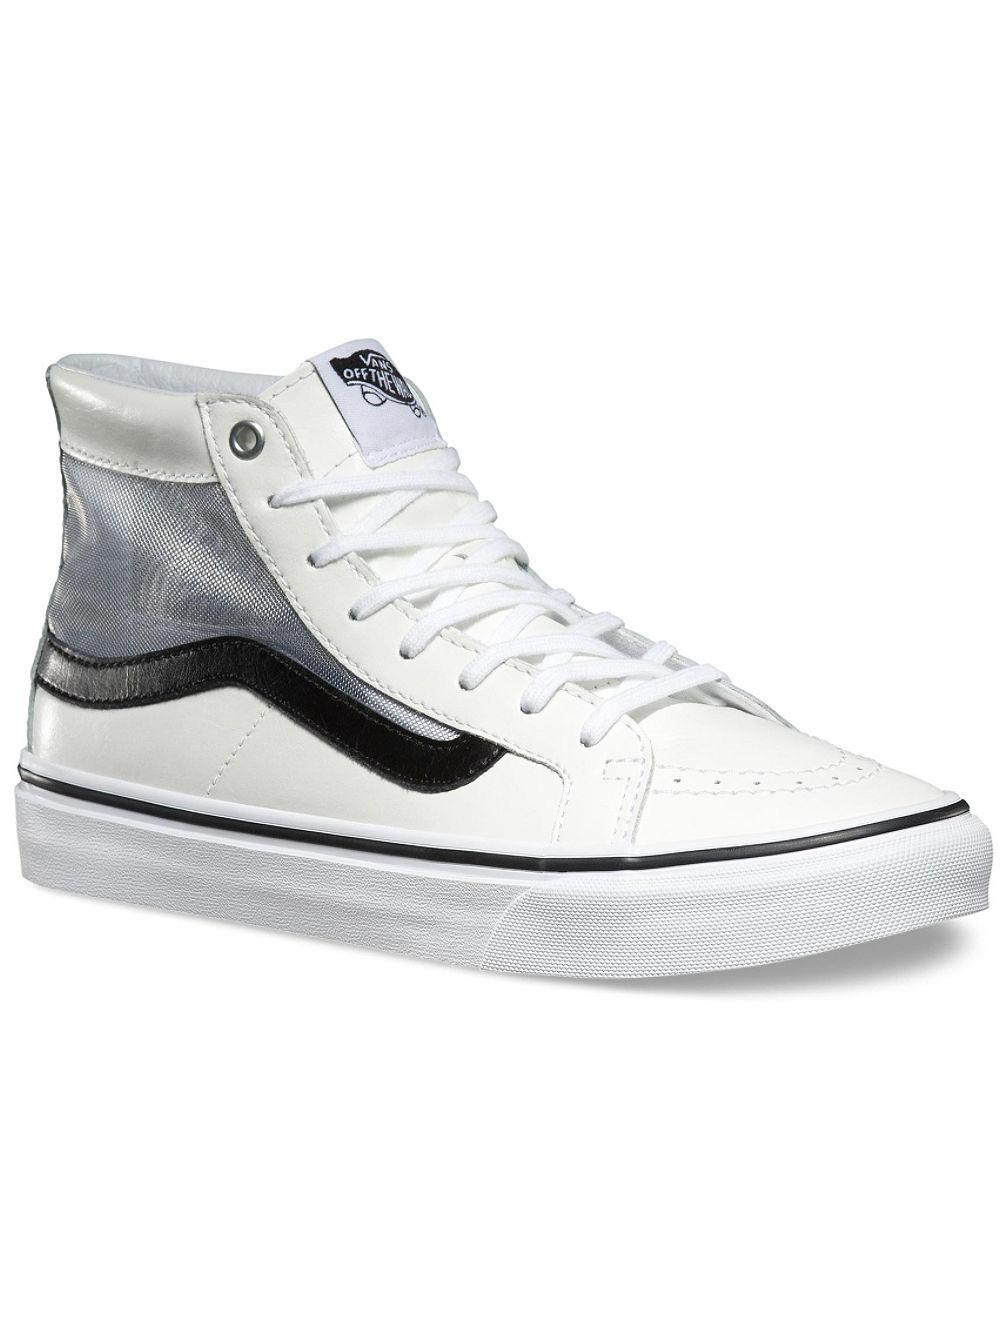 24331330f5bd29 Vans Sk8-Hi Slim Cutout Sneakers Women online kaufen bei Blue Tomato